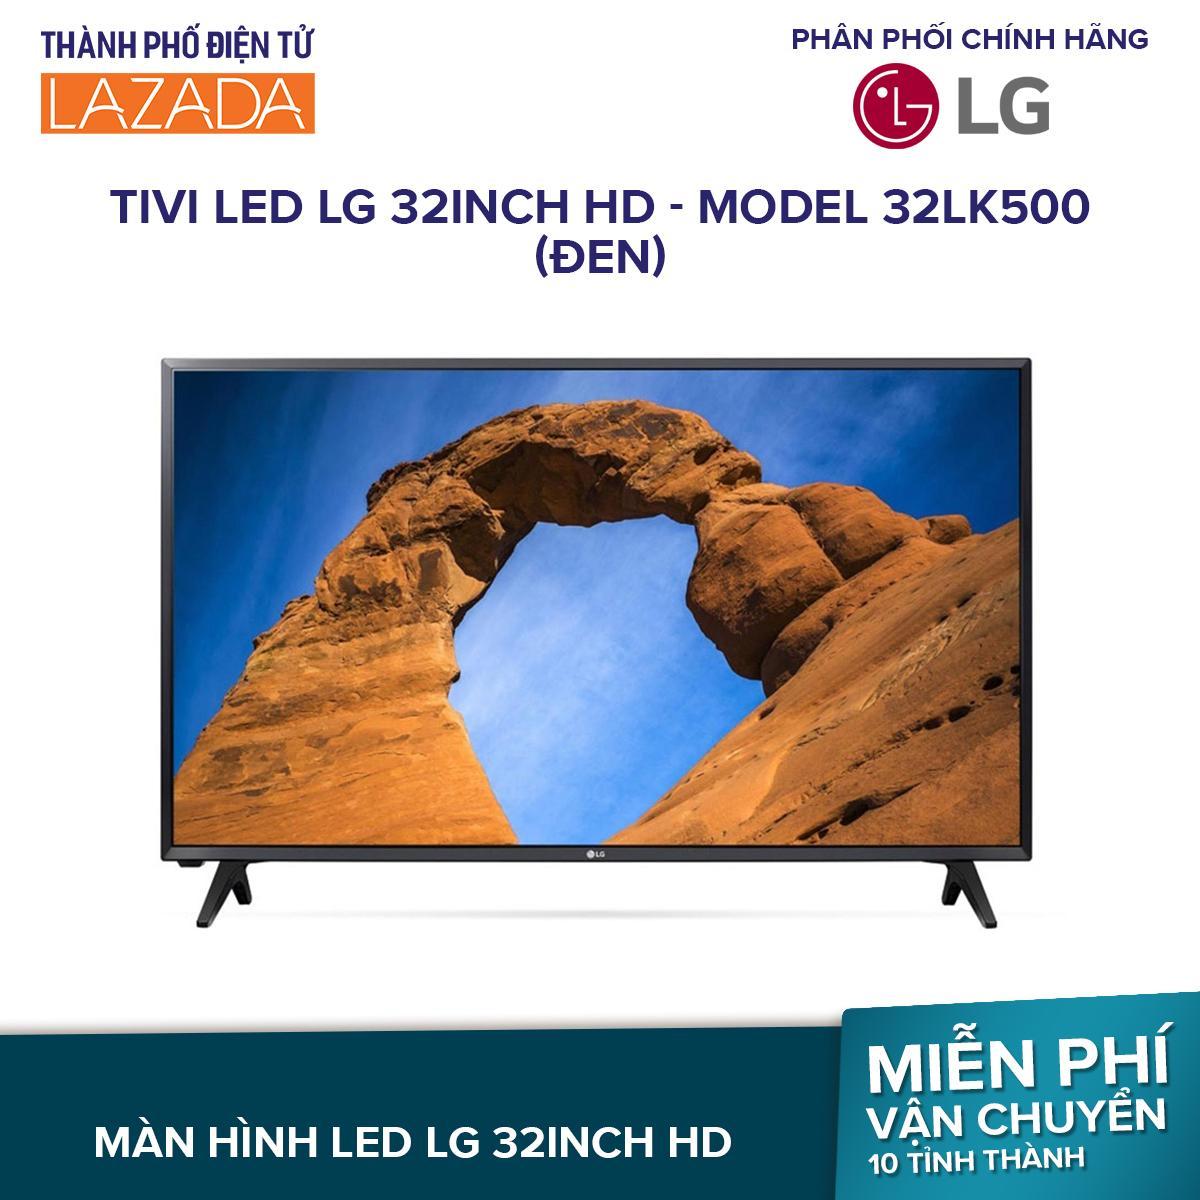 Tivi LED LG 32inch HD - Model 32LK500 (Đen)